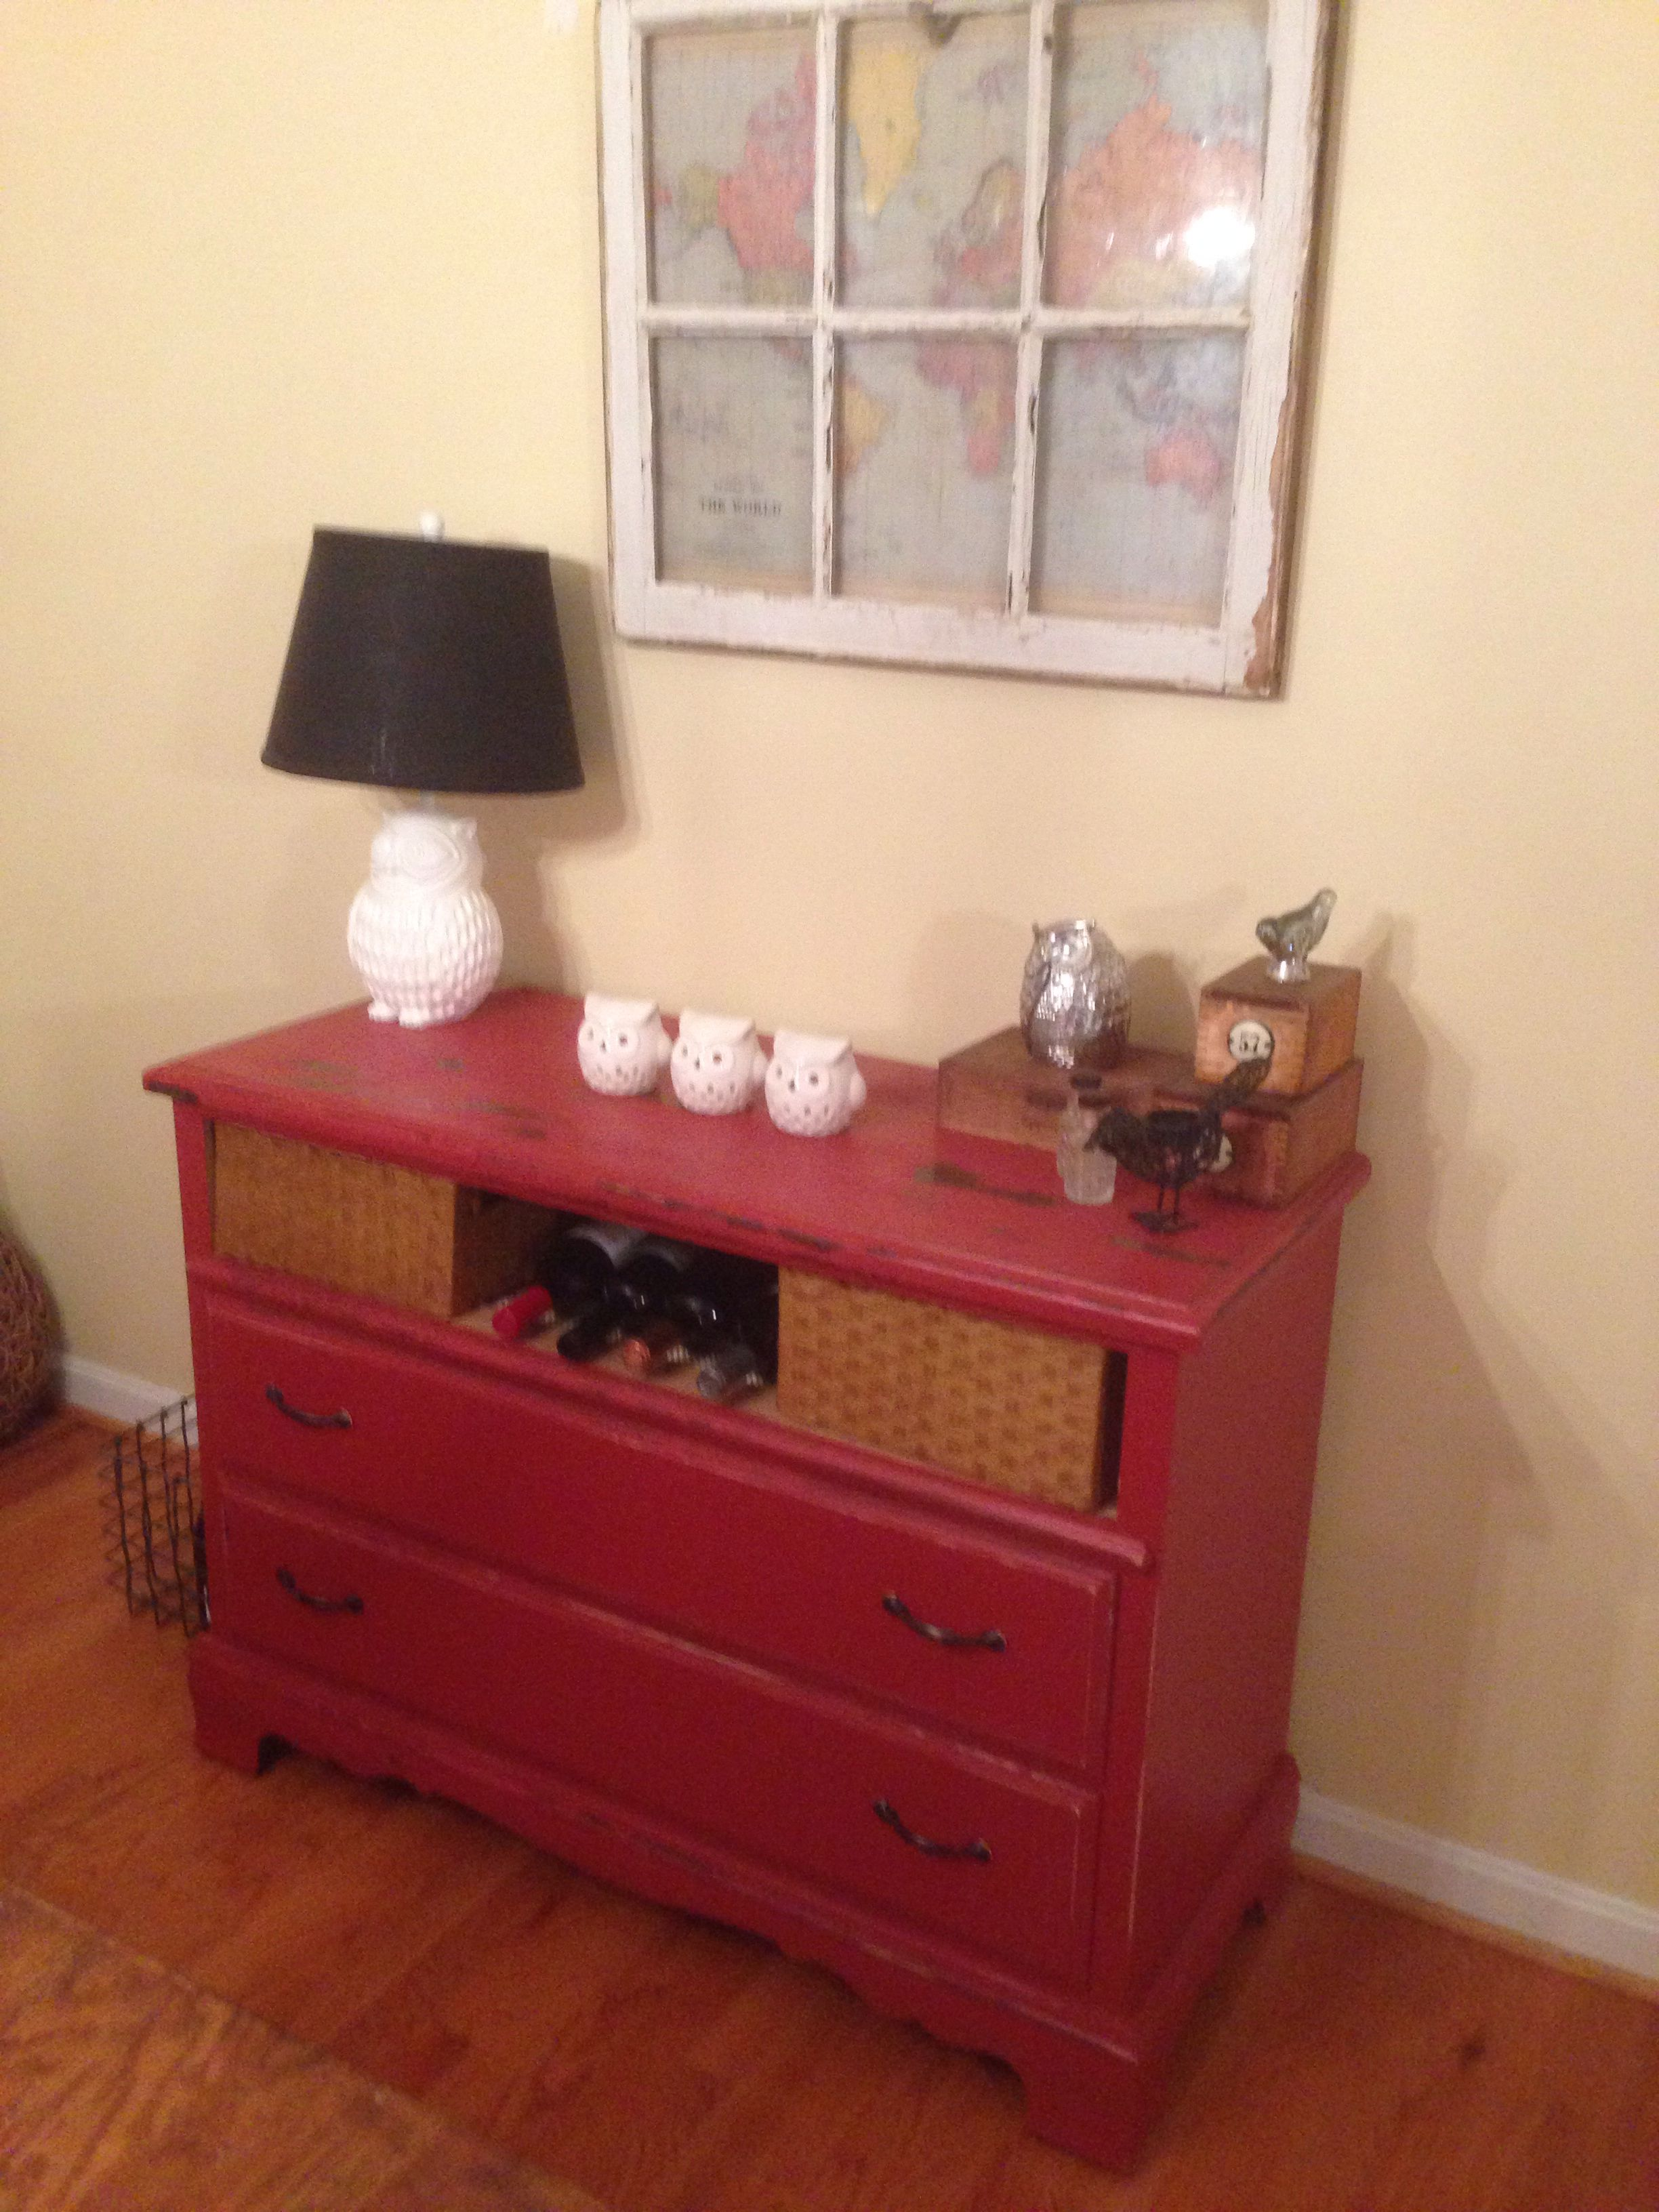 Repurposed dresser adds storage to dining room! | DIY ...